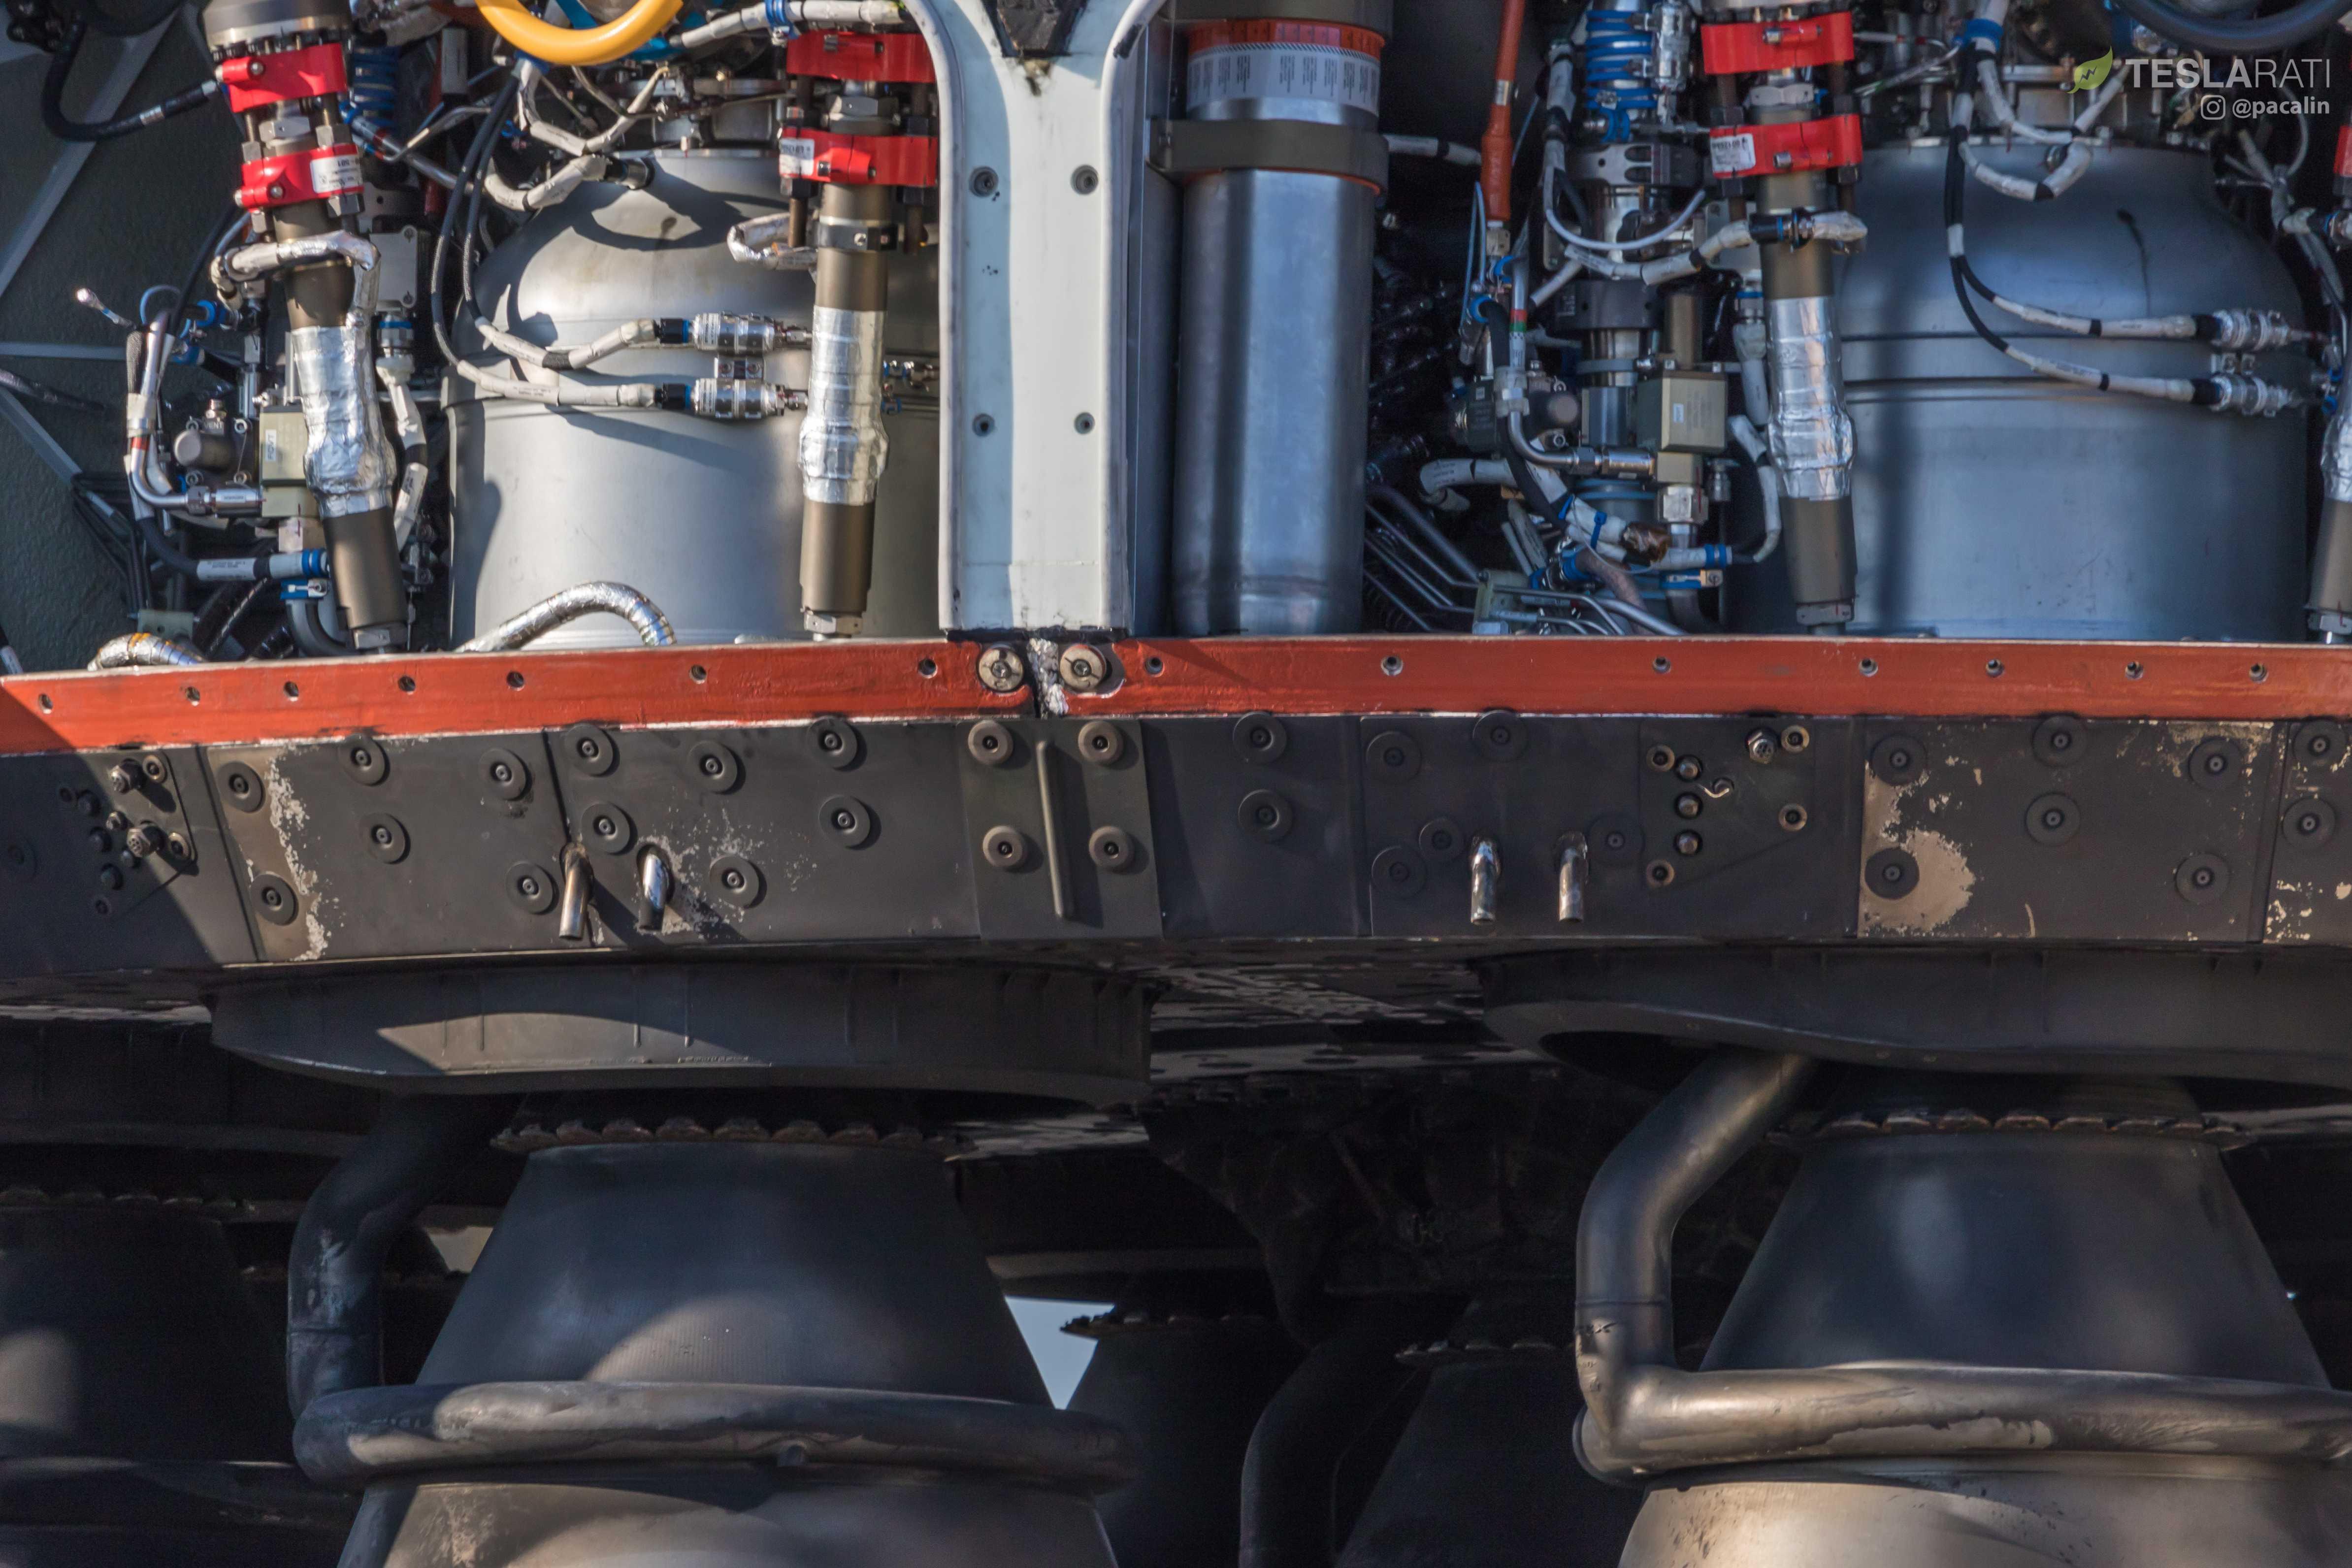 F9 B1048 engine bay and octaweb (Pauline Acalin) (19)(c)